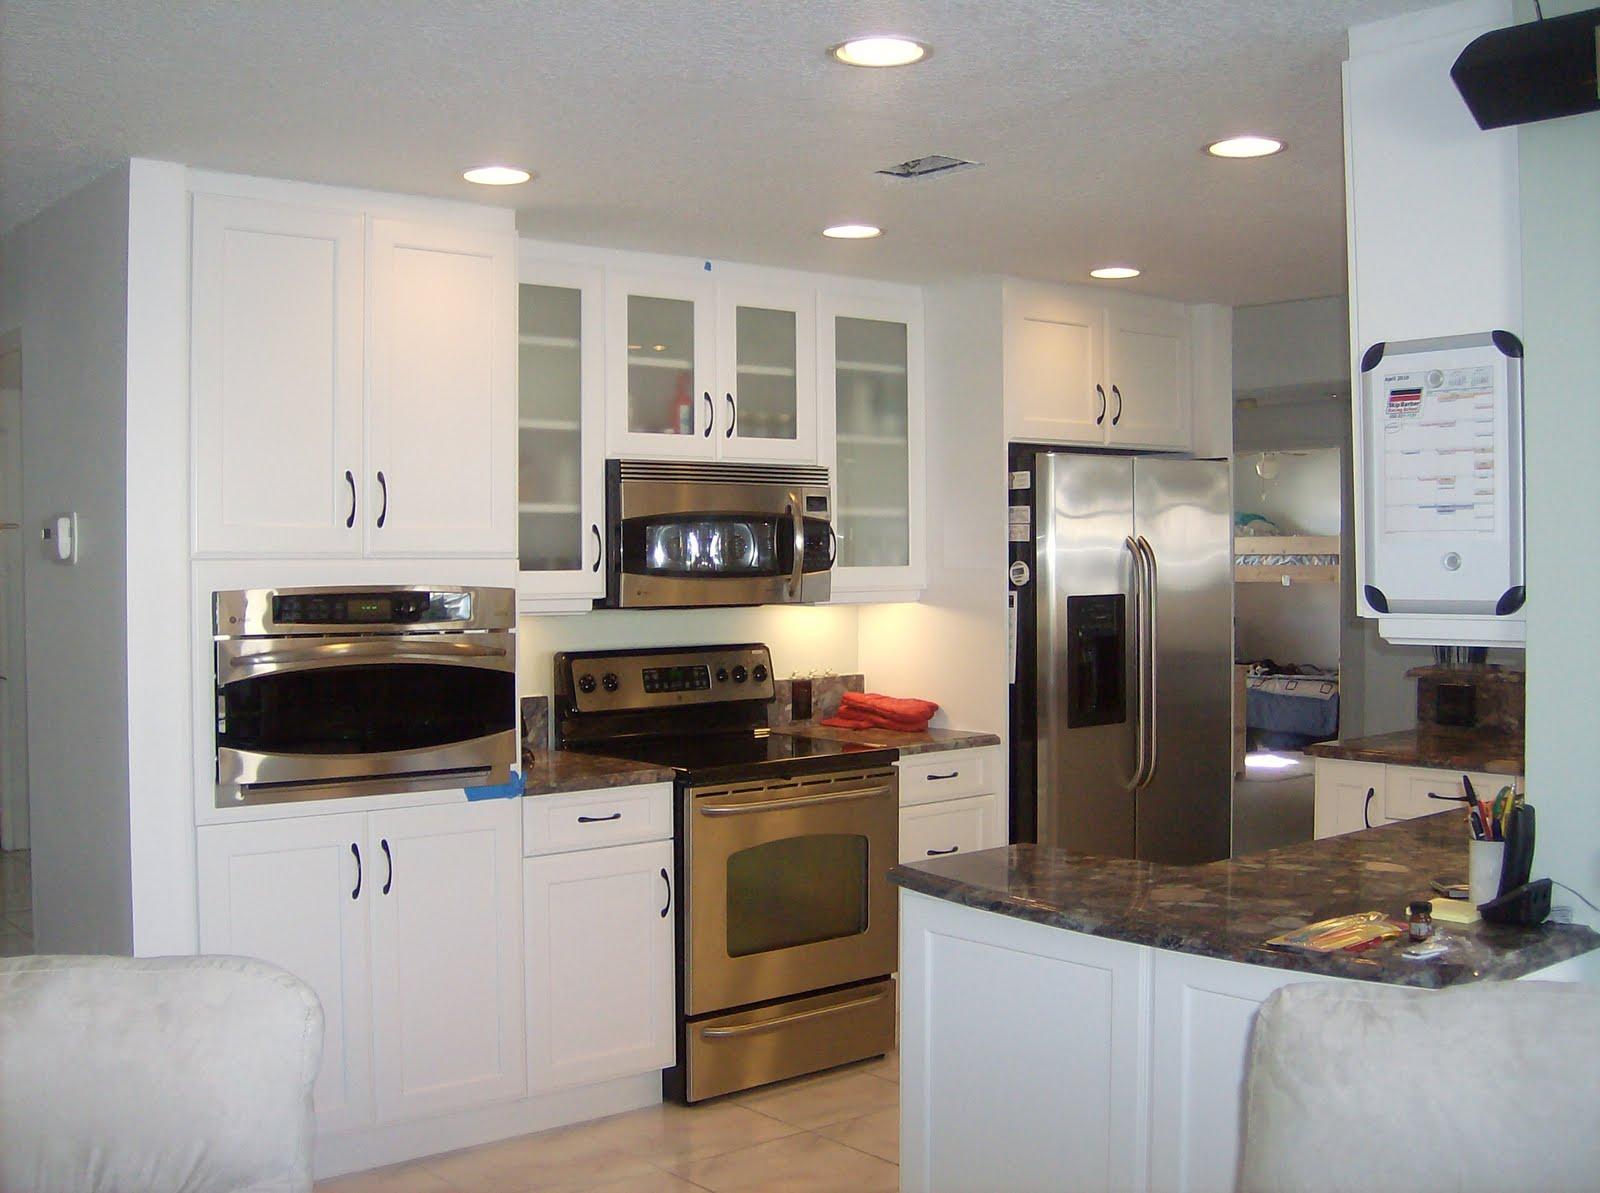 Kitchens For Living April 2010